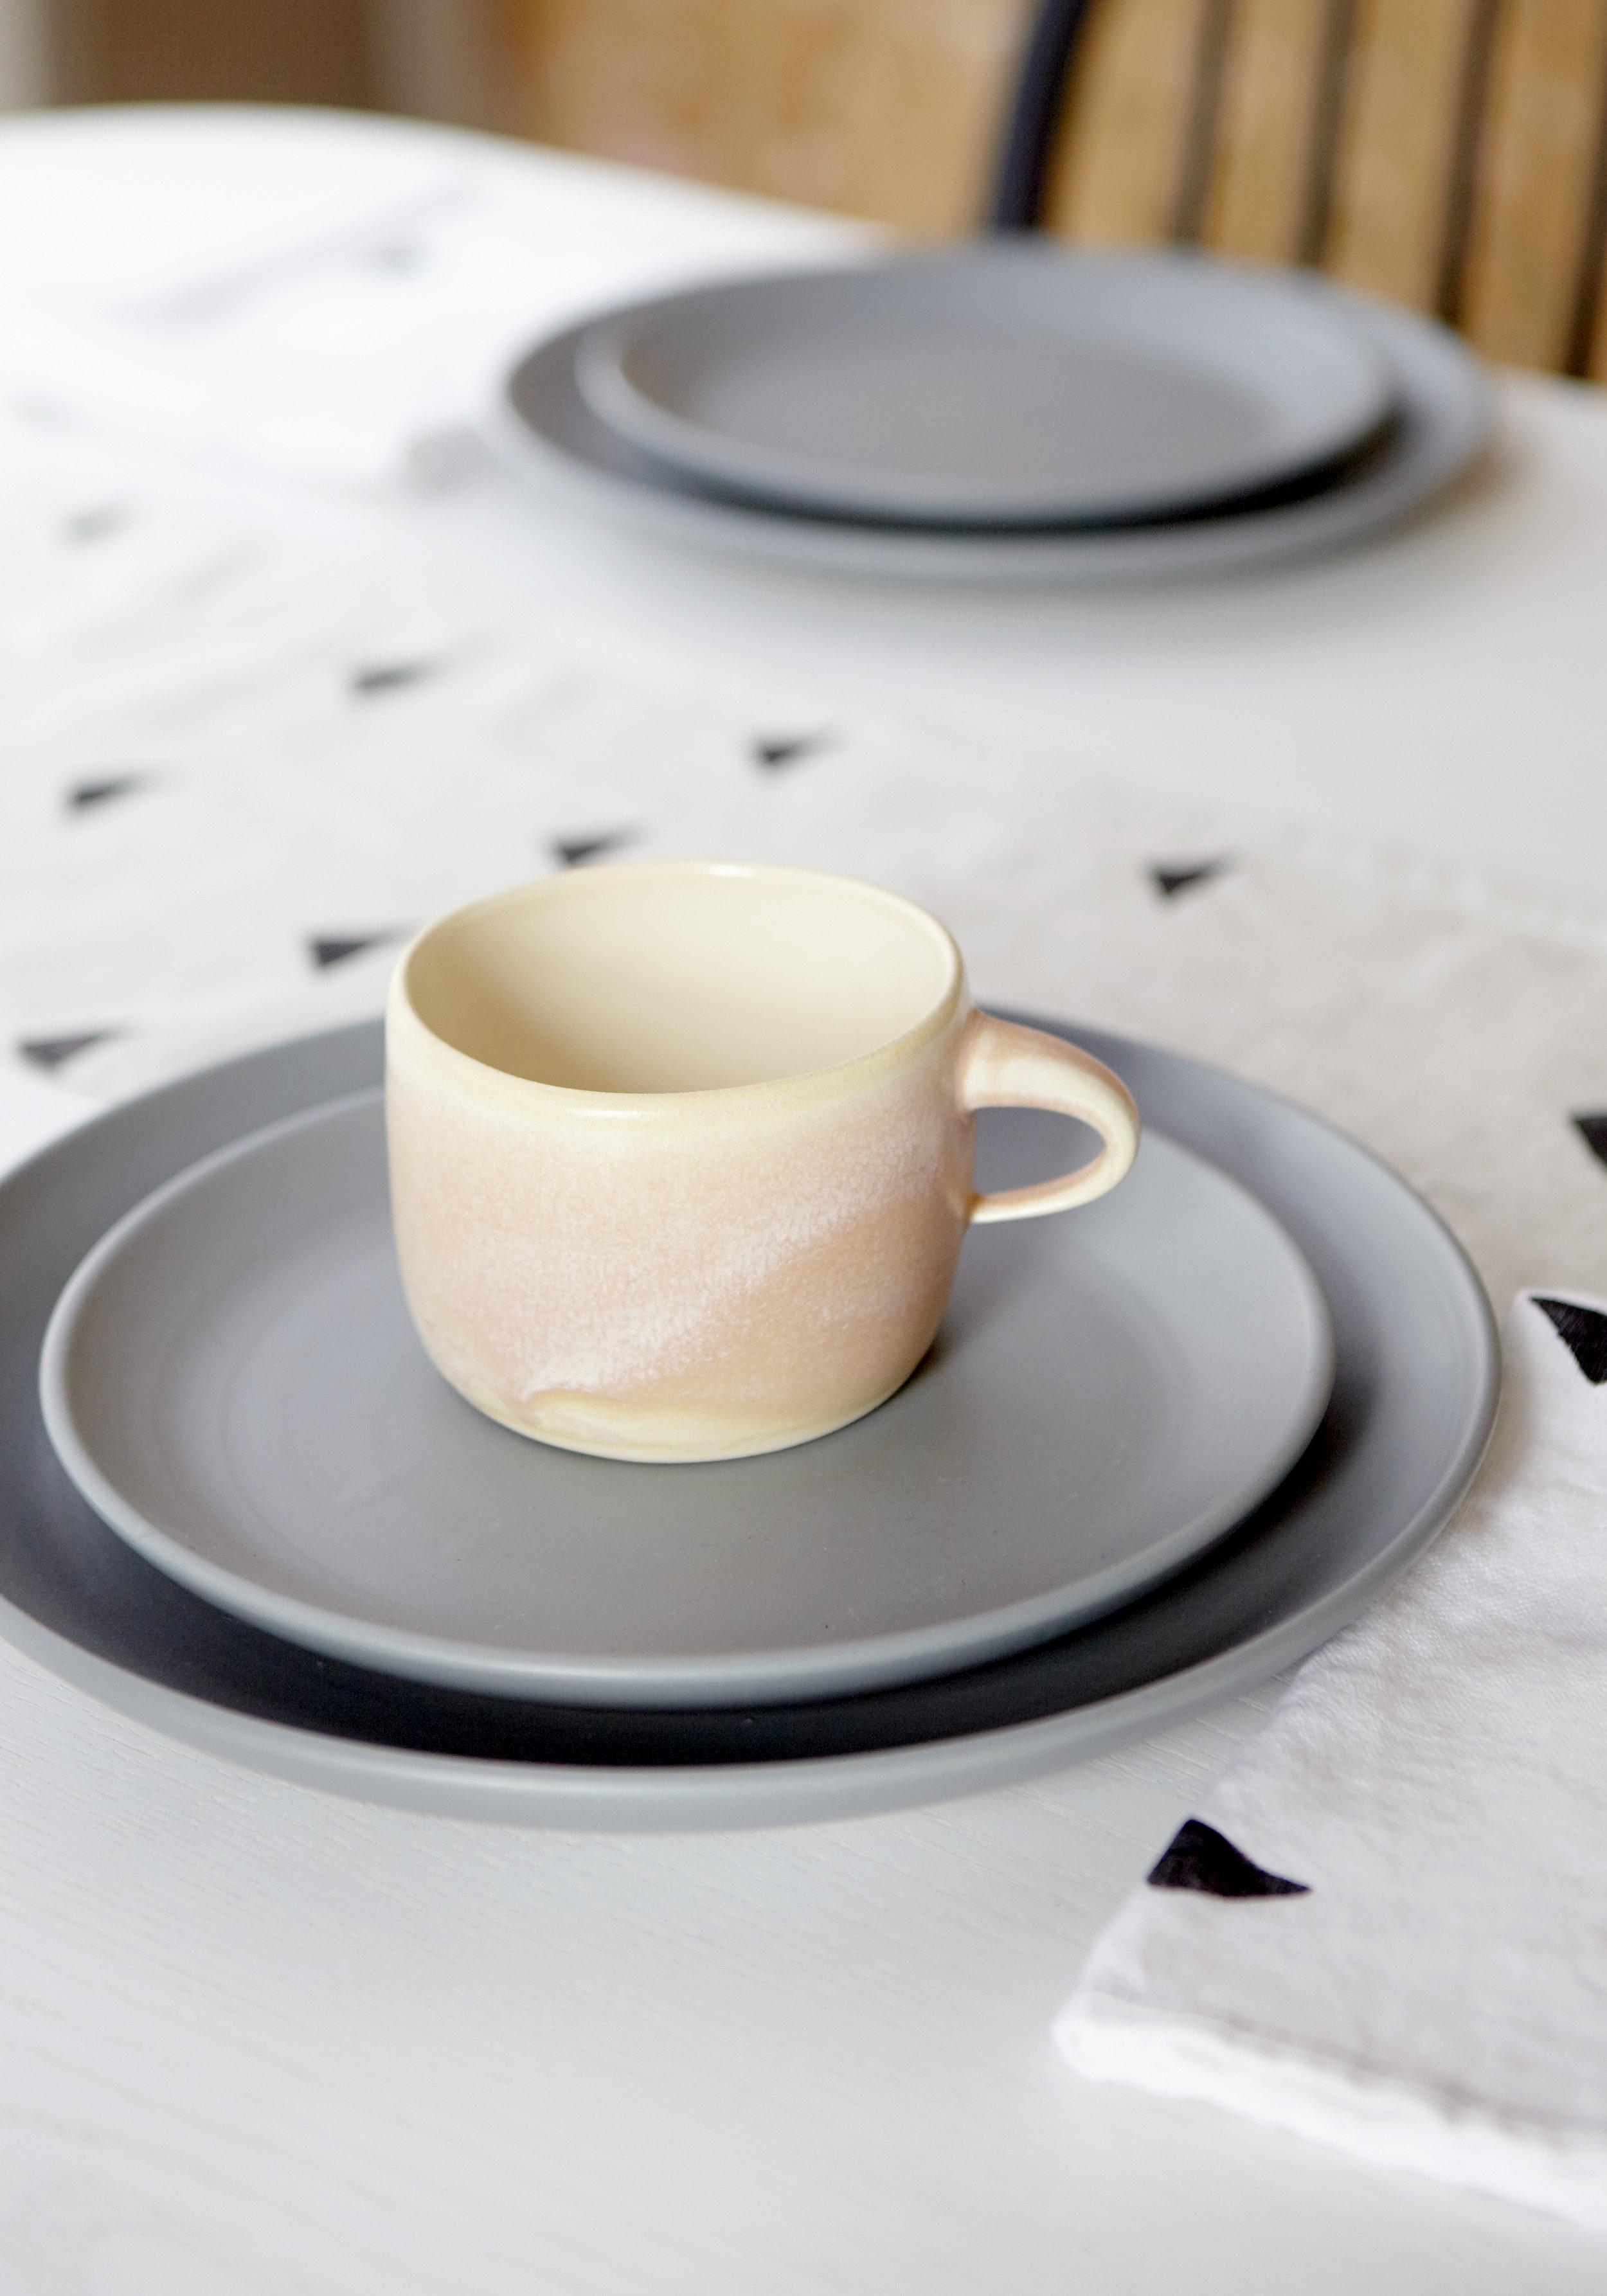 CG Ceramics for BF Home demitasse